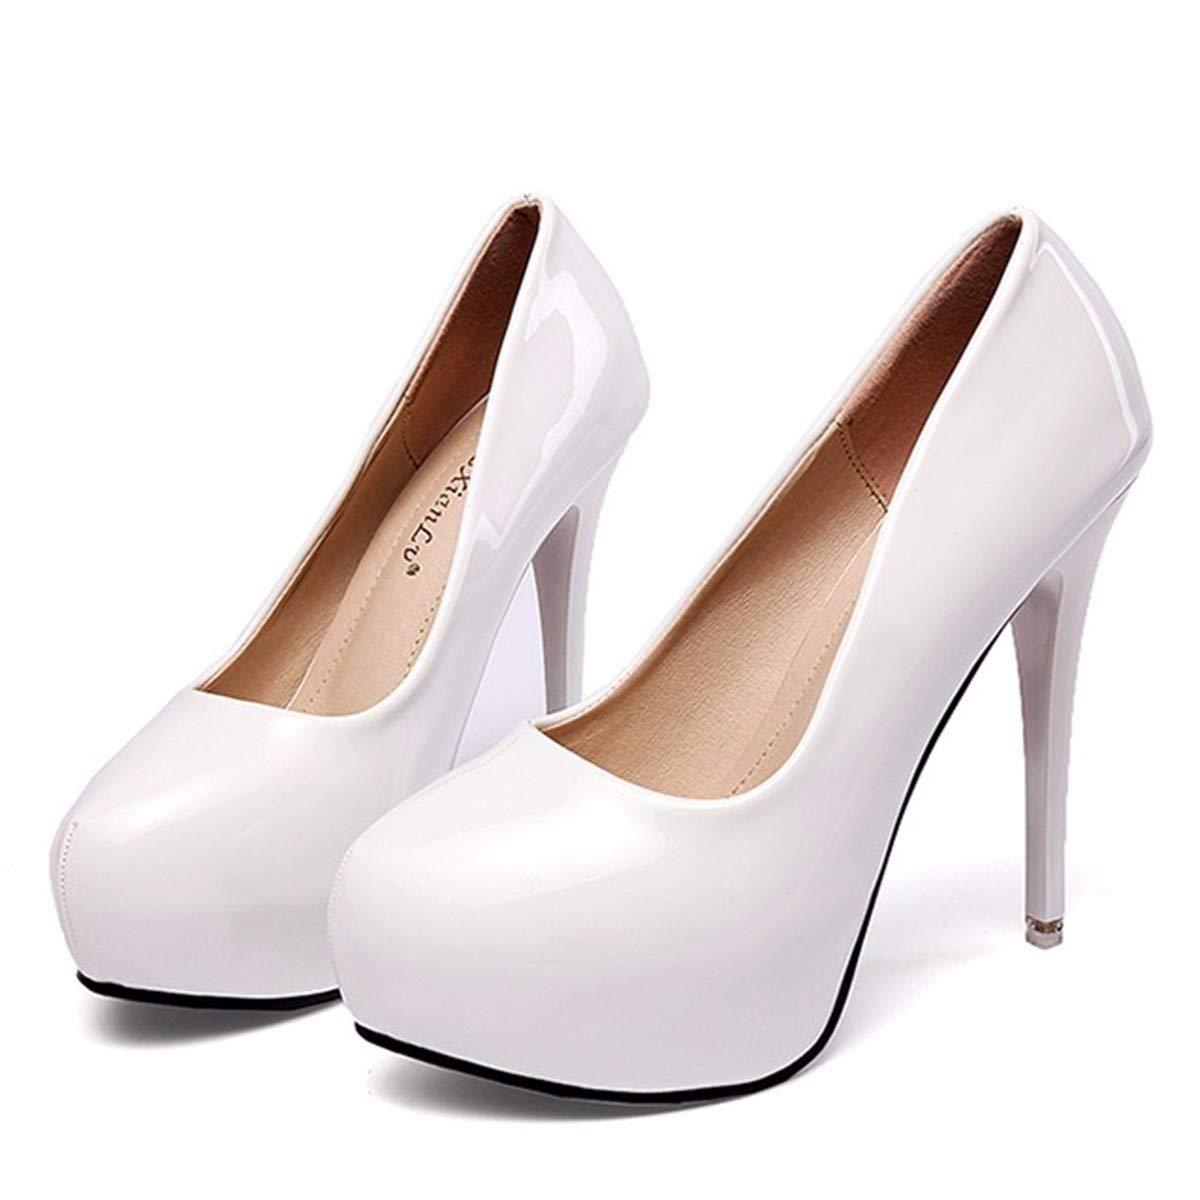 GTVERNH Damenschuhe Mode High - Heel 12Cm Gut mit Lack Haut Flach Herbst Lack Professionelle Runde Schuhe.